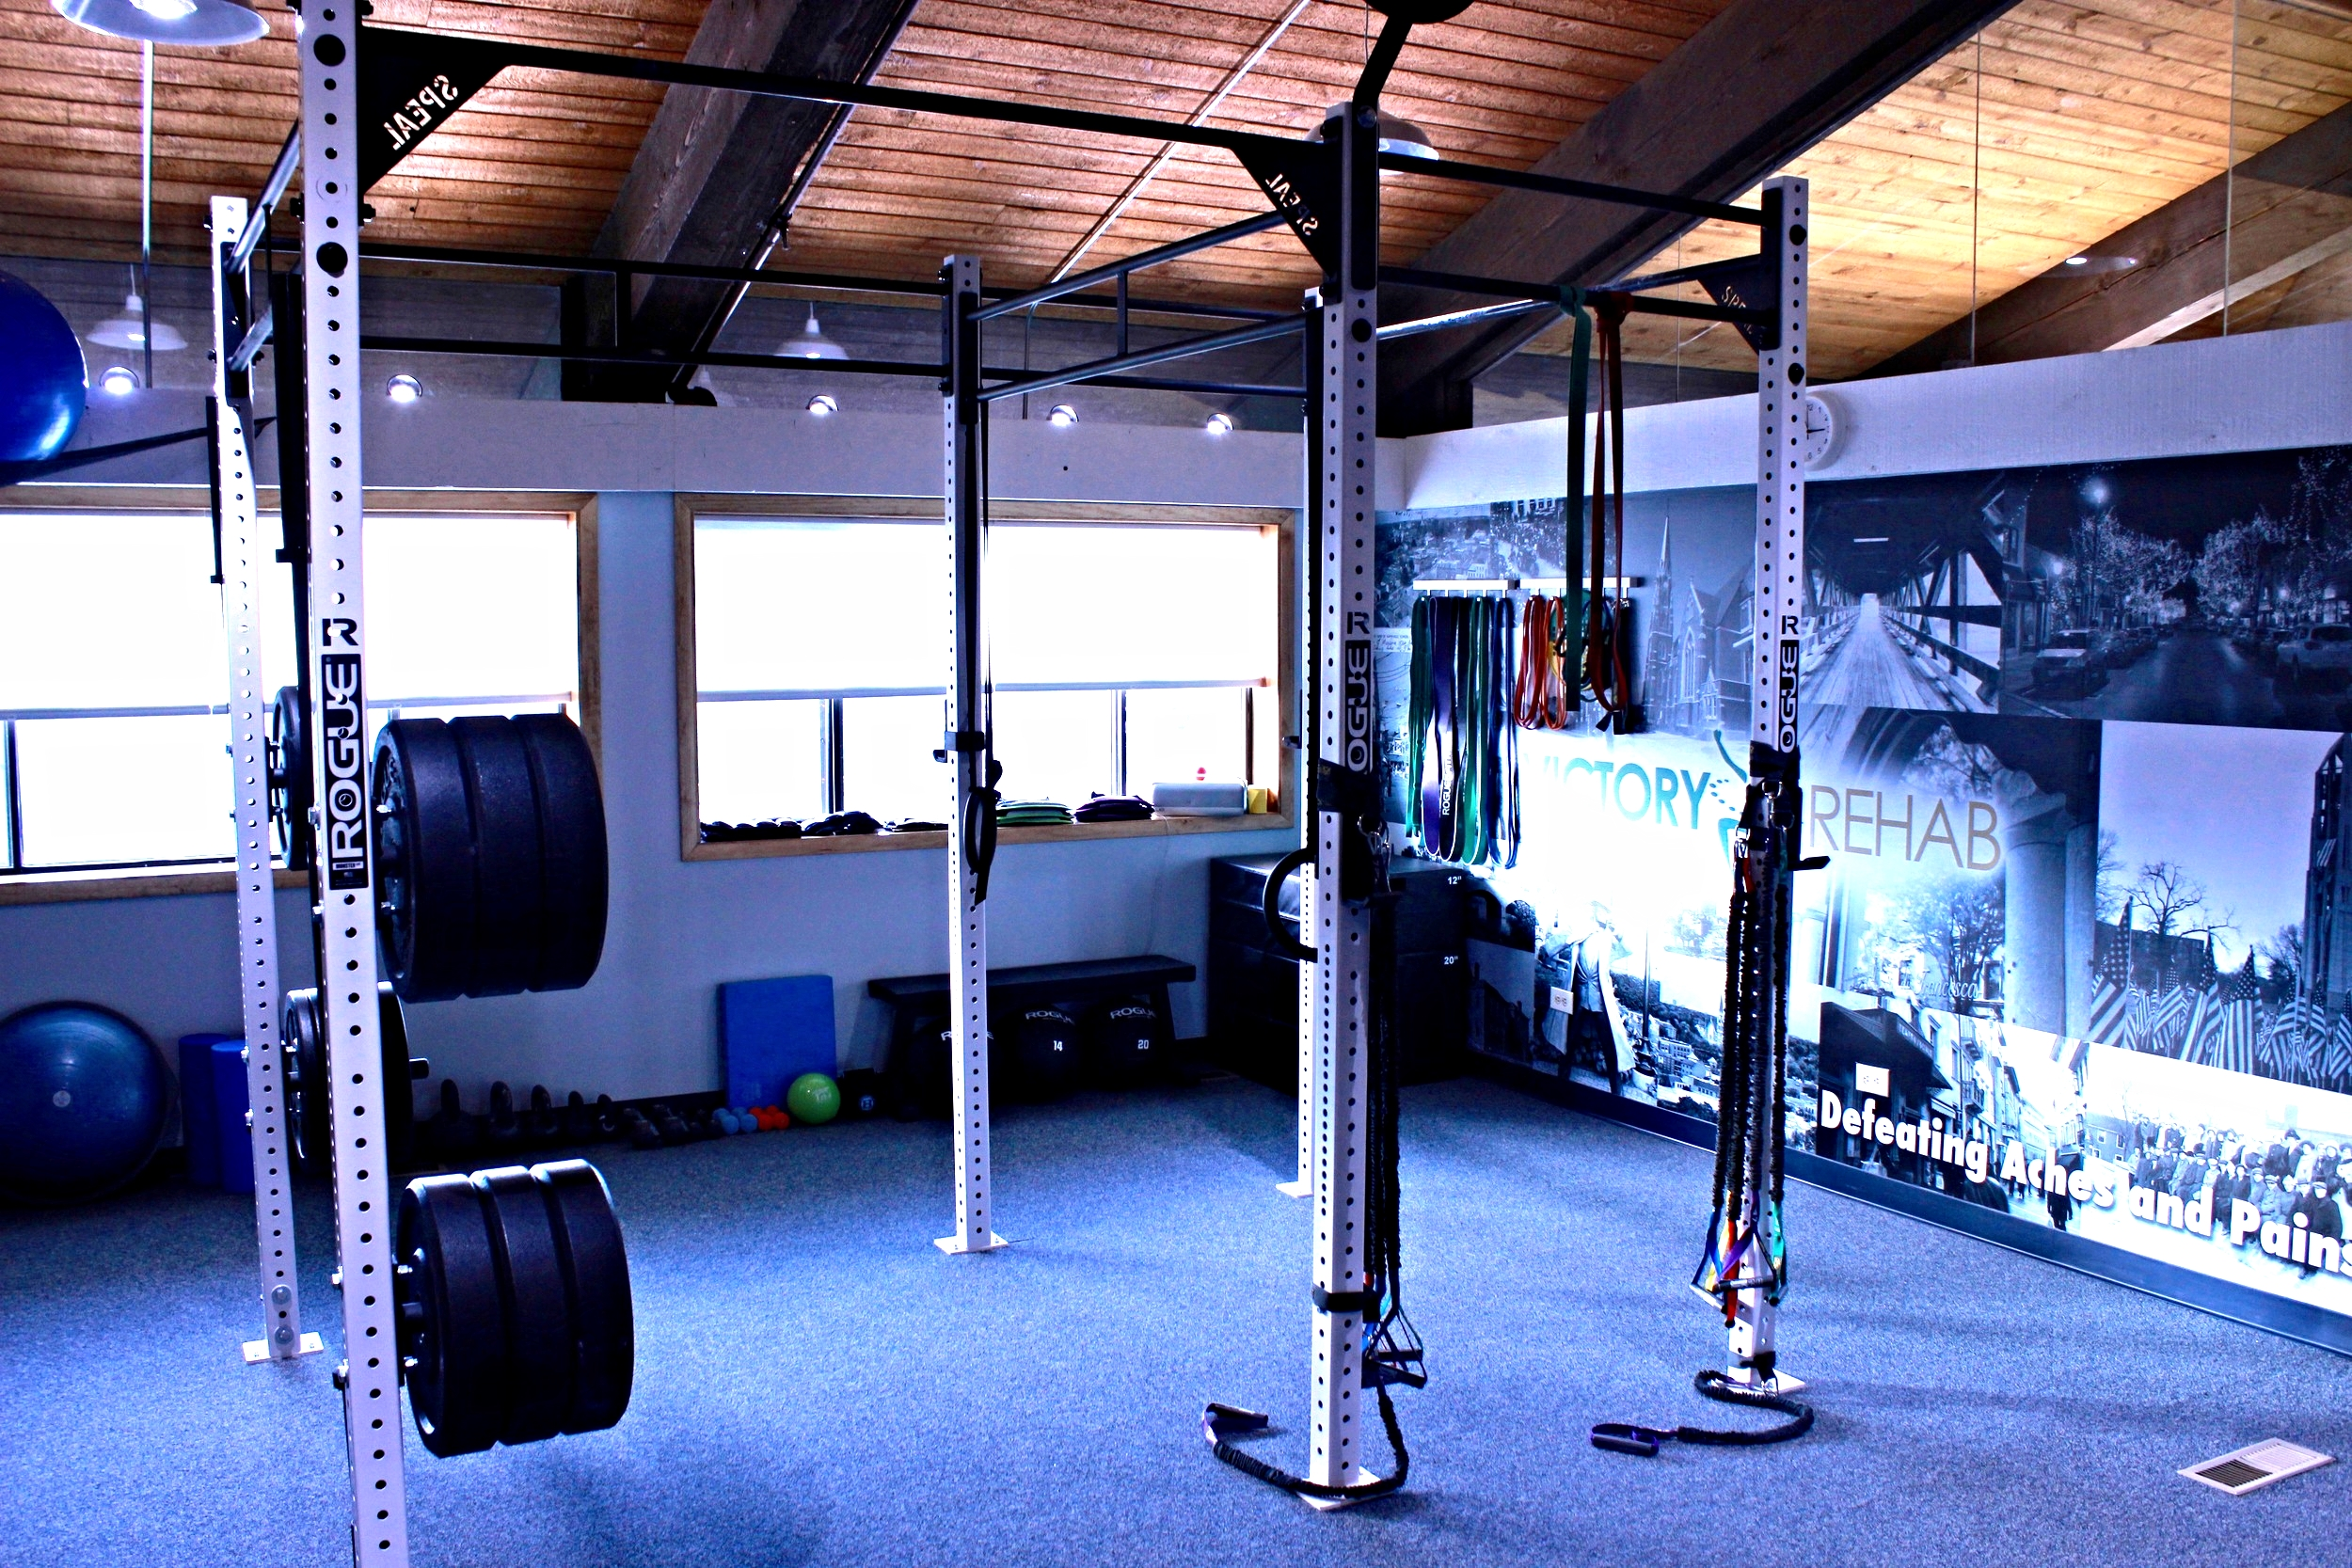 Victory Rehab Interior 1.jpg